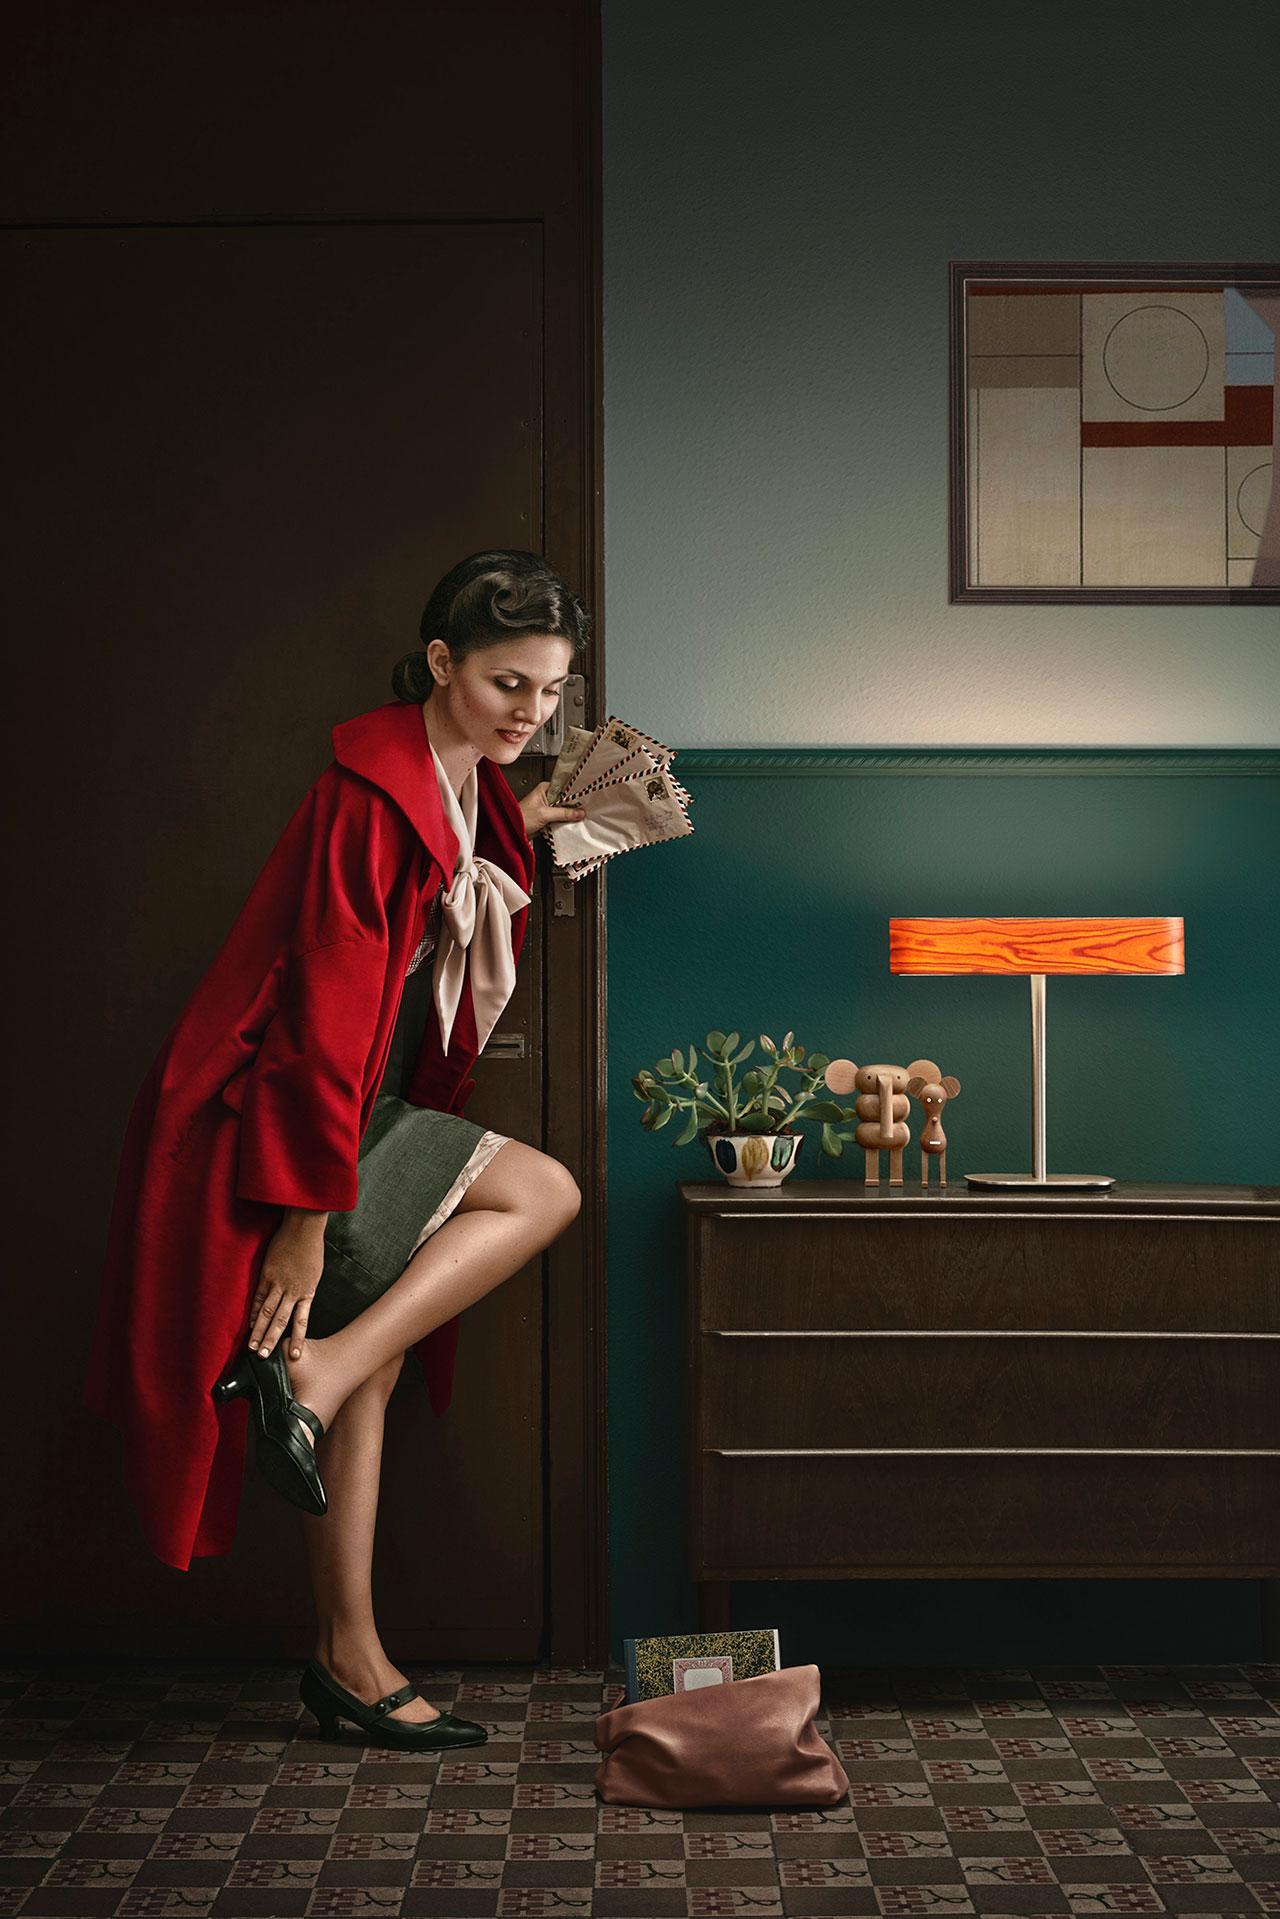 f1_lzf_lamps_telling_tales_campaign_2016_marivi_calvo_photo_maria_mira_and_cualiti_yatzer